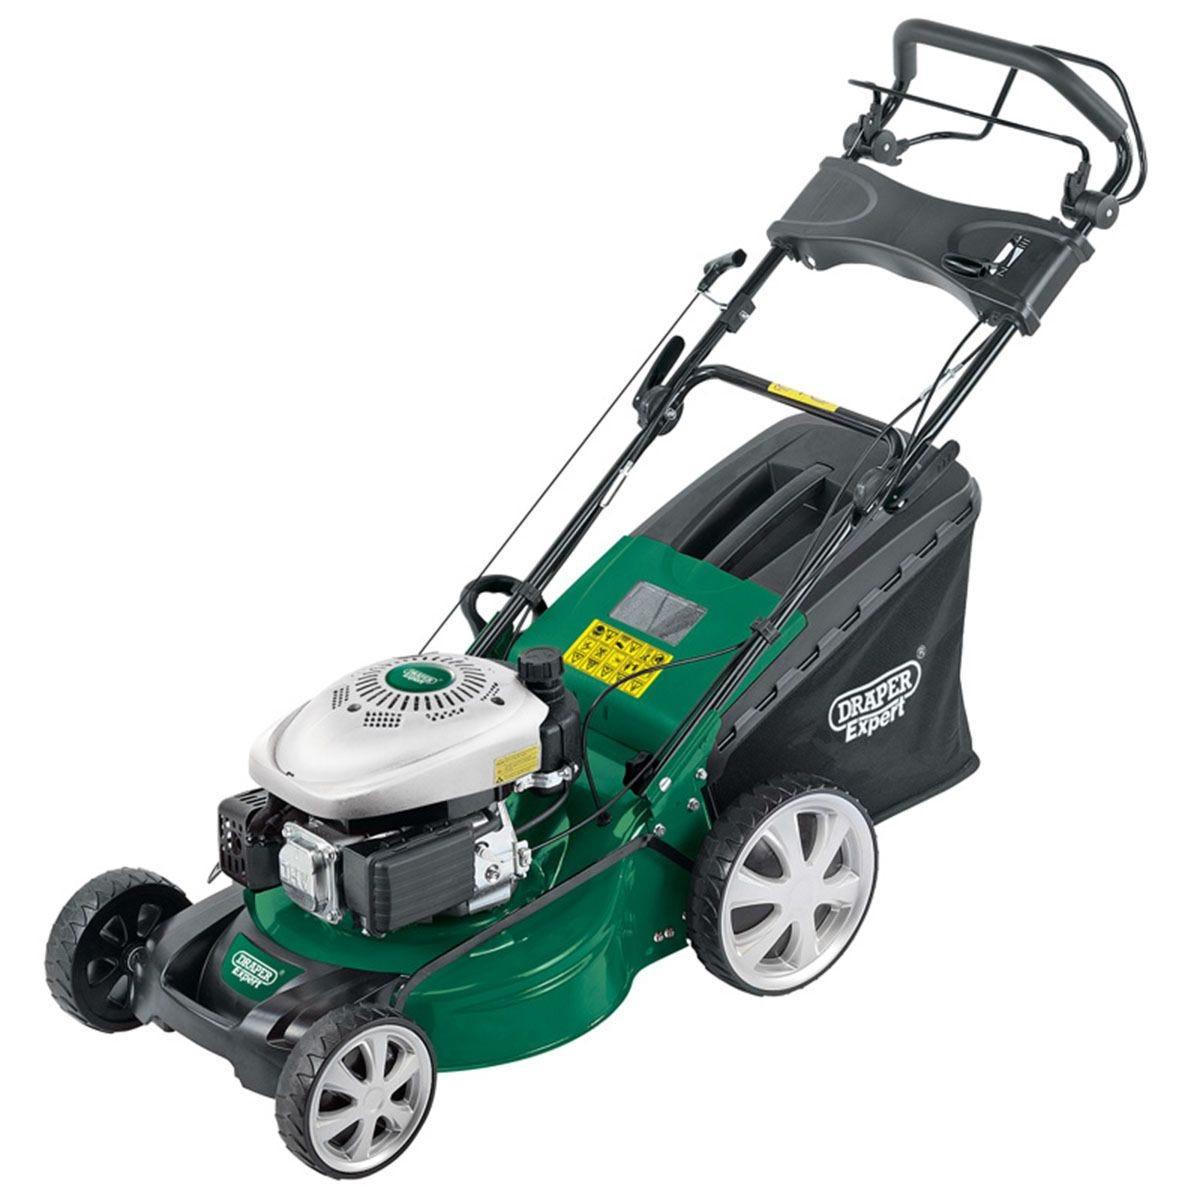 Draper 3-in-1 460mm Self-Propelled Petrol Lawn Mower (135cc/3.2HP) - Green and Black